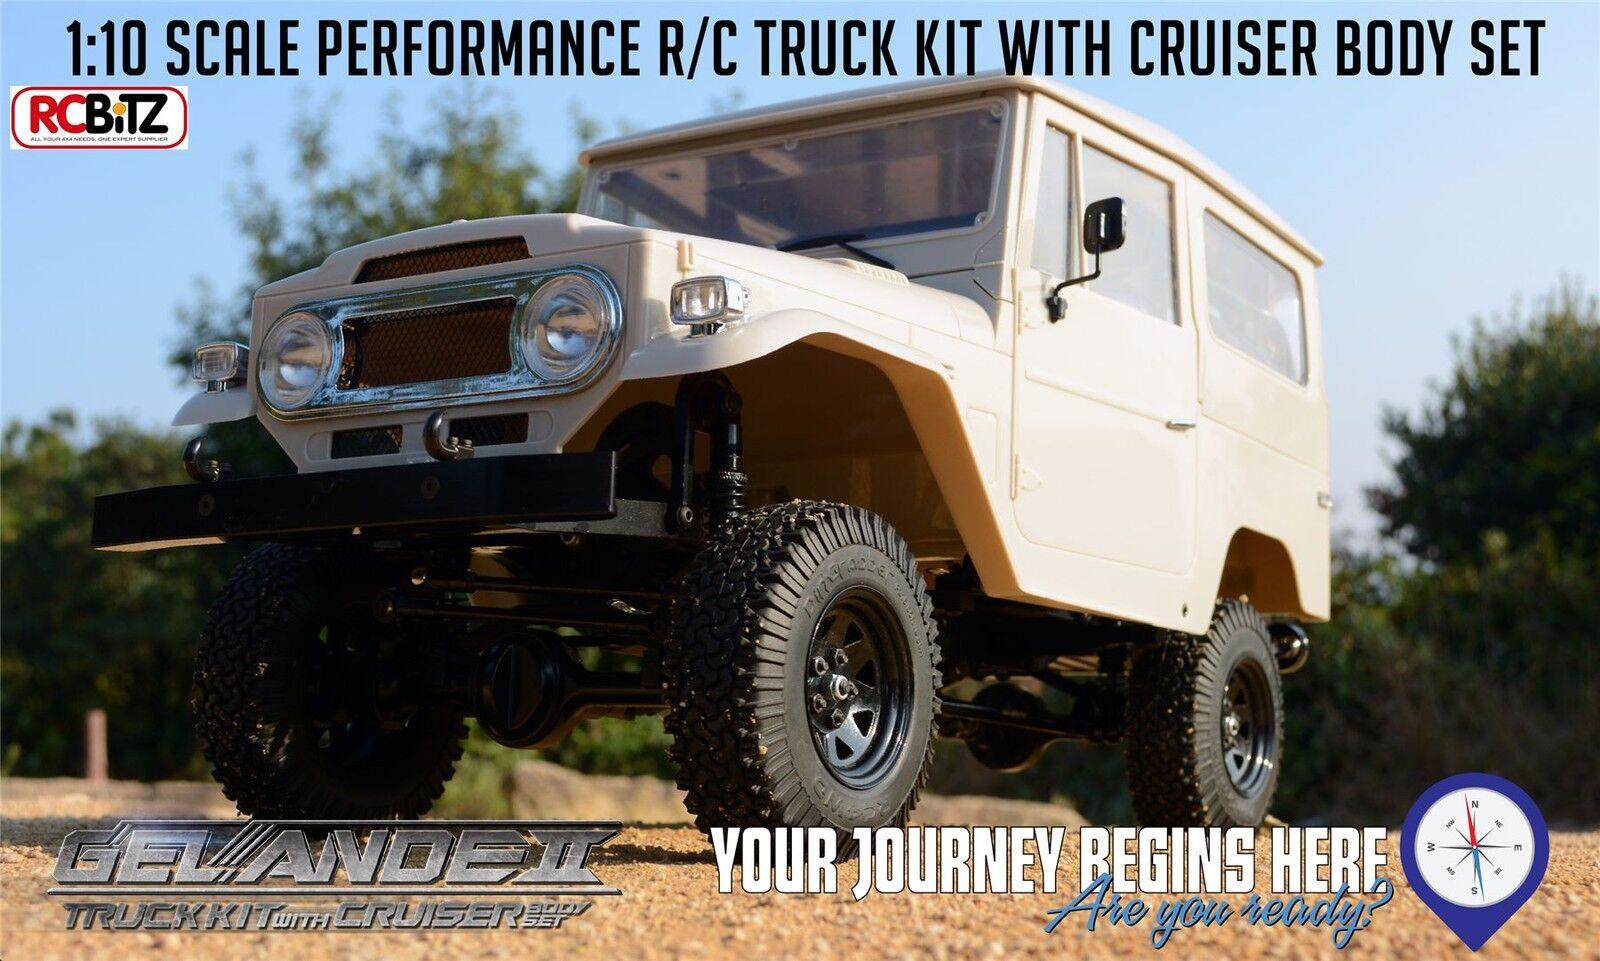 KIT Gelee II CAMION giocattoloota CRUISER  Hard corpo dettagli interni FJ40 RC4WD Z-K0051  sconto